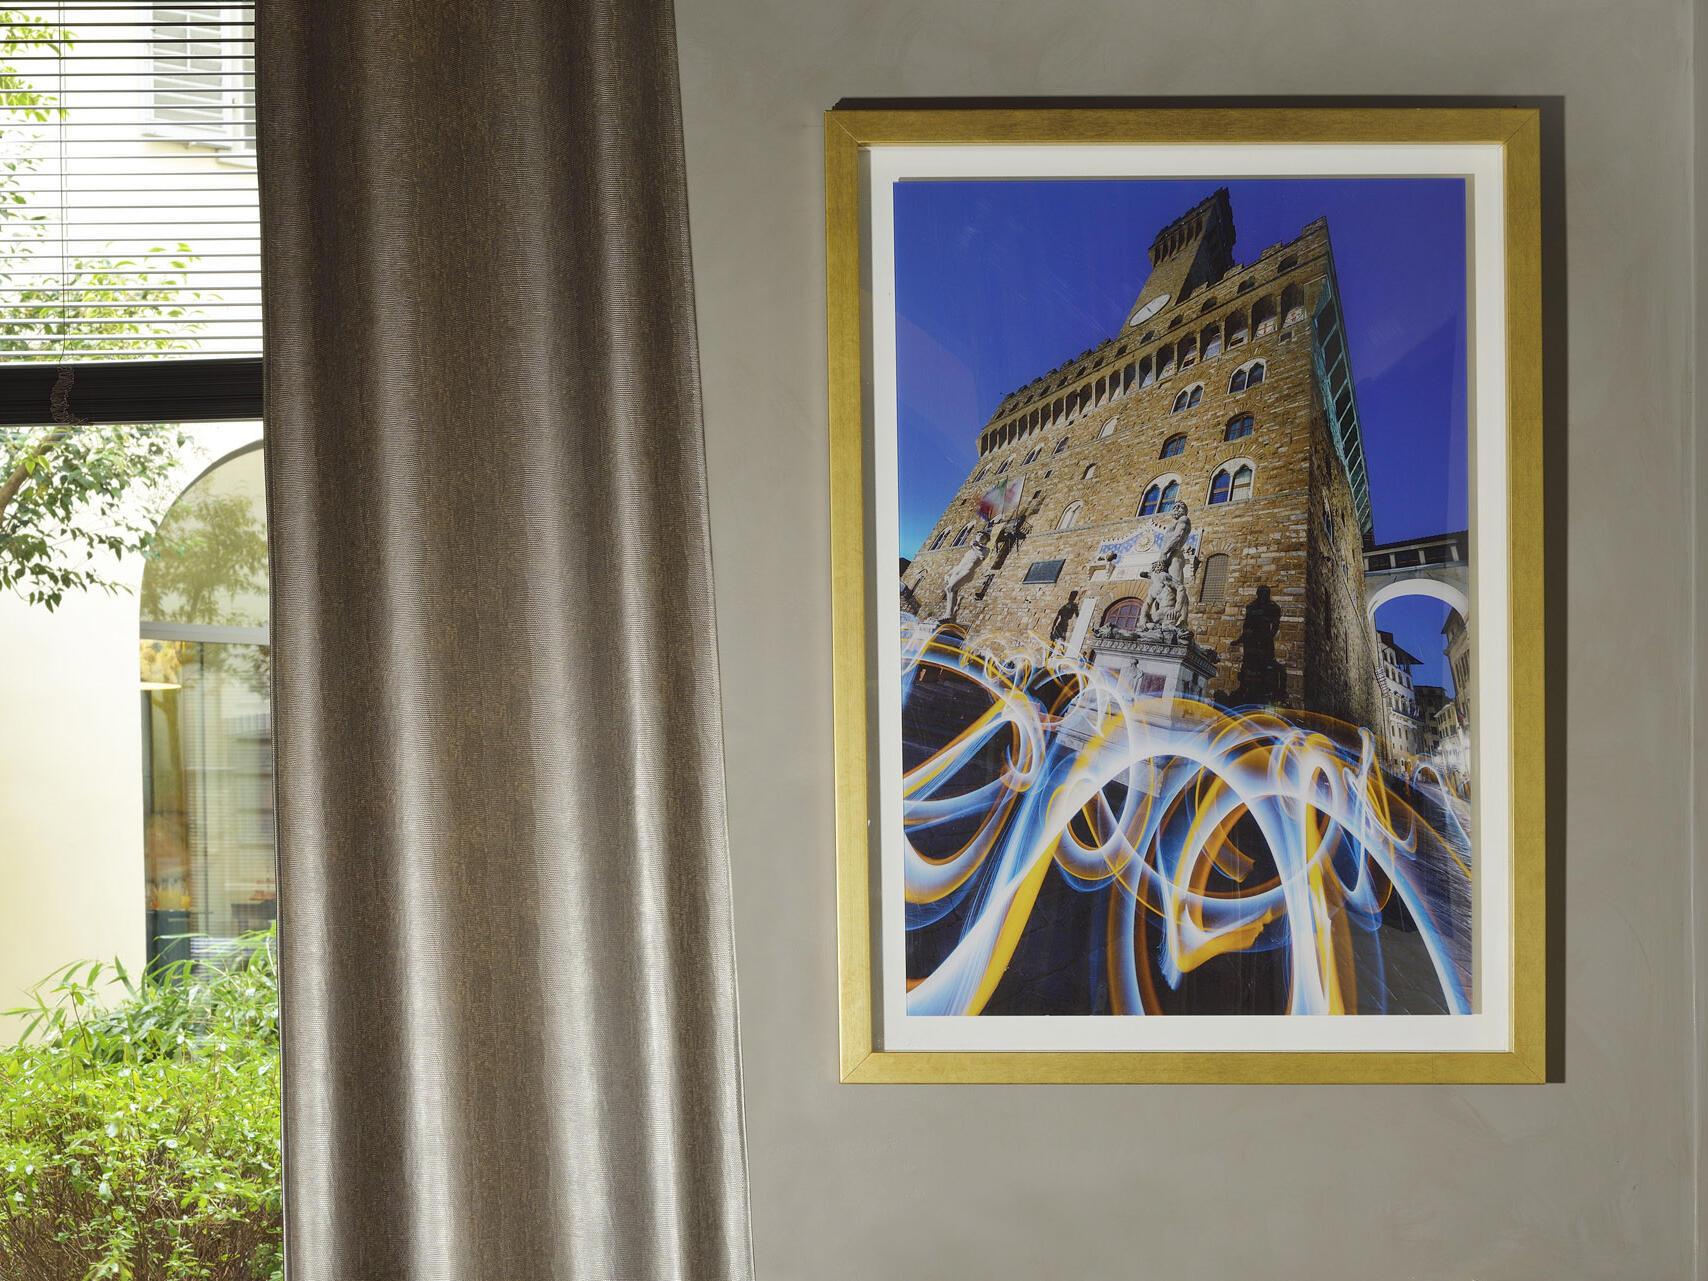 A Wall Art frame  at Grand Hotel Minerva